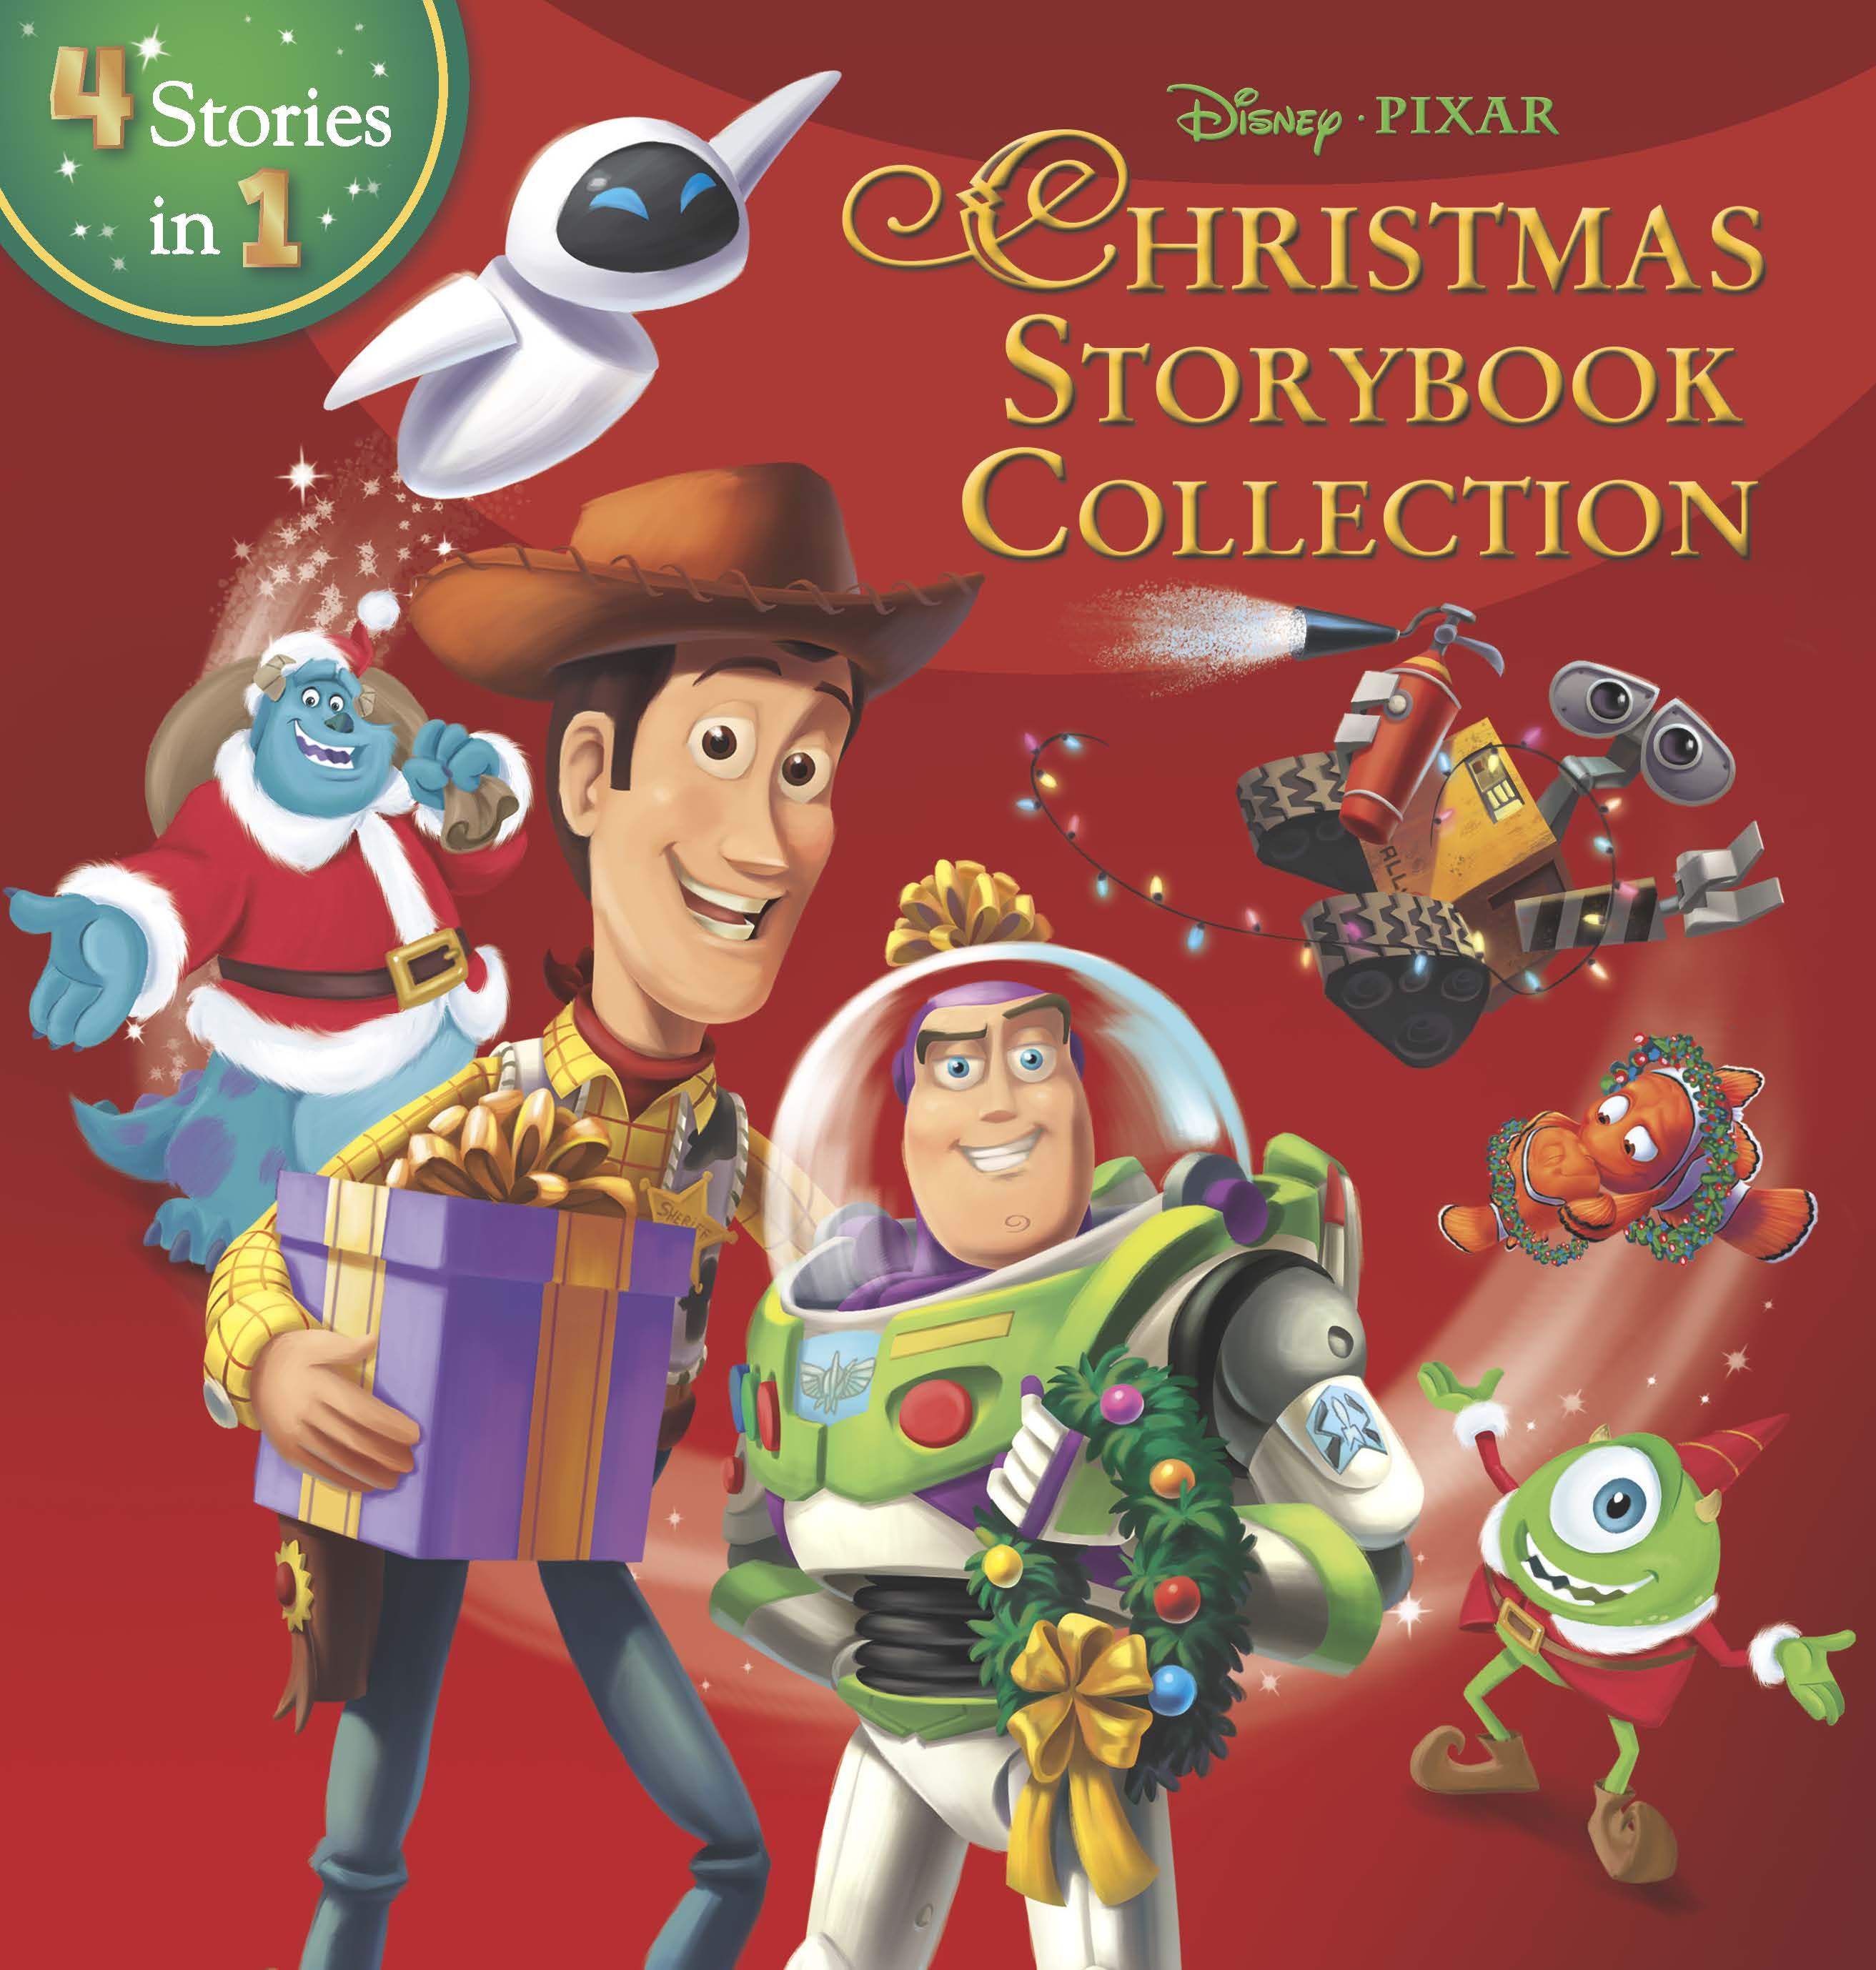 Disney*Pixar Christmas Storybook Collection